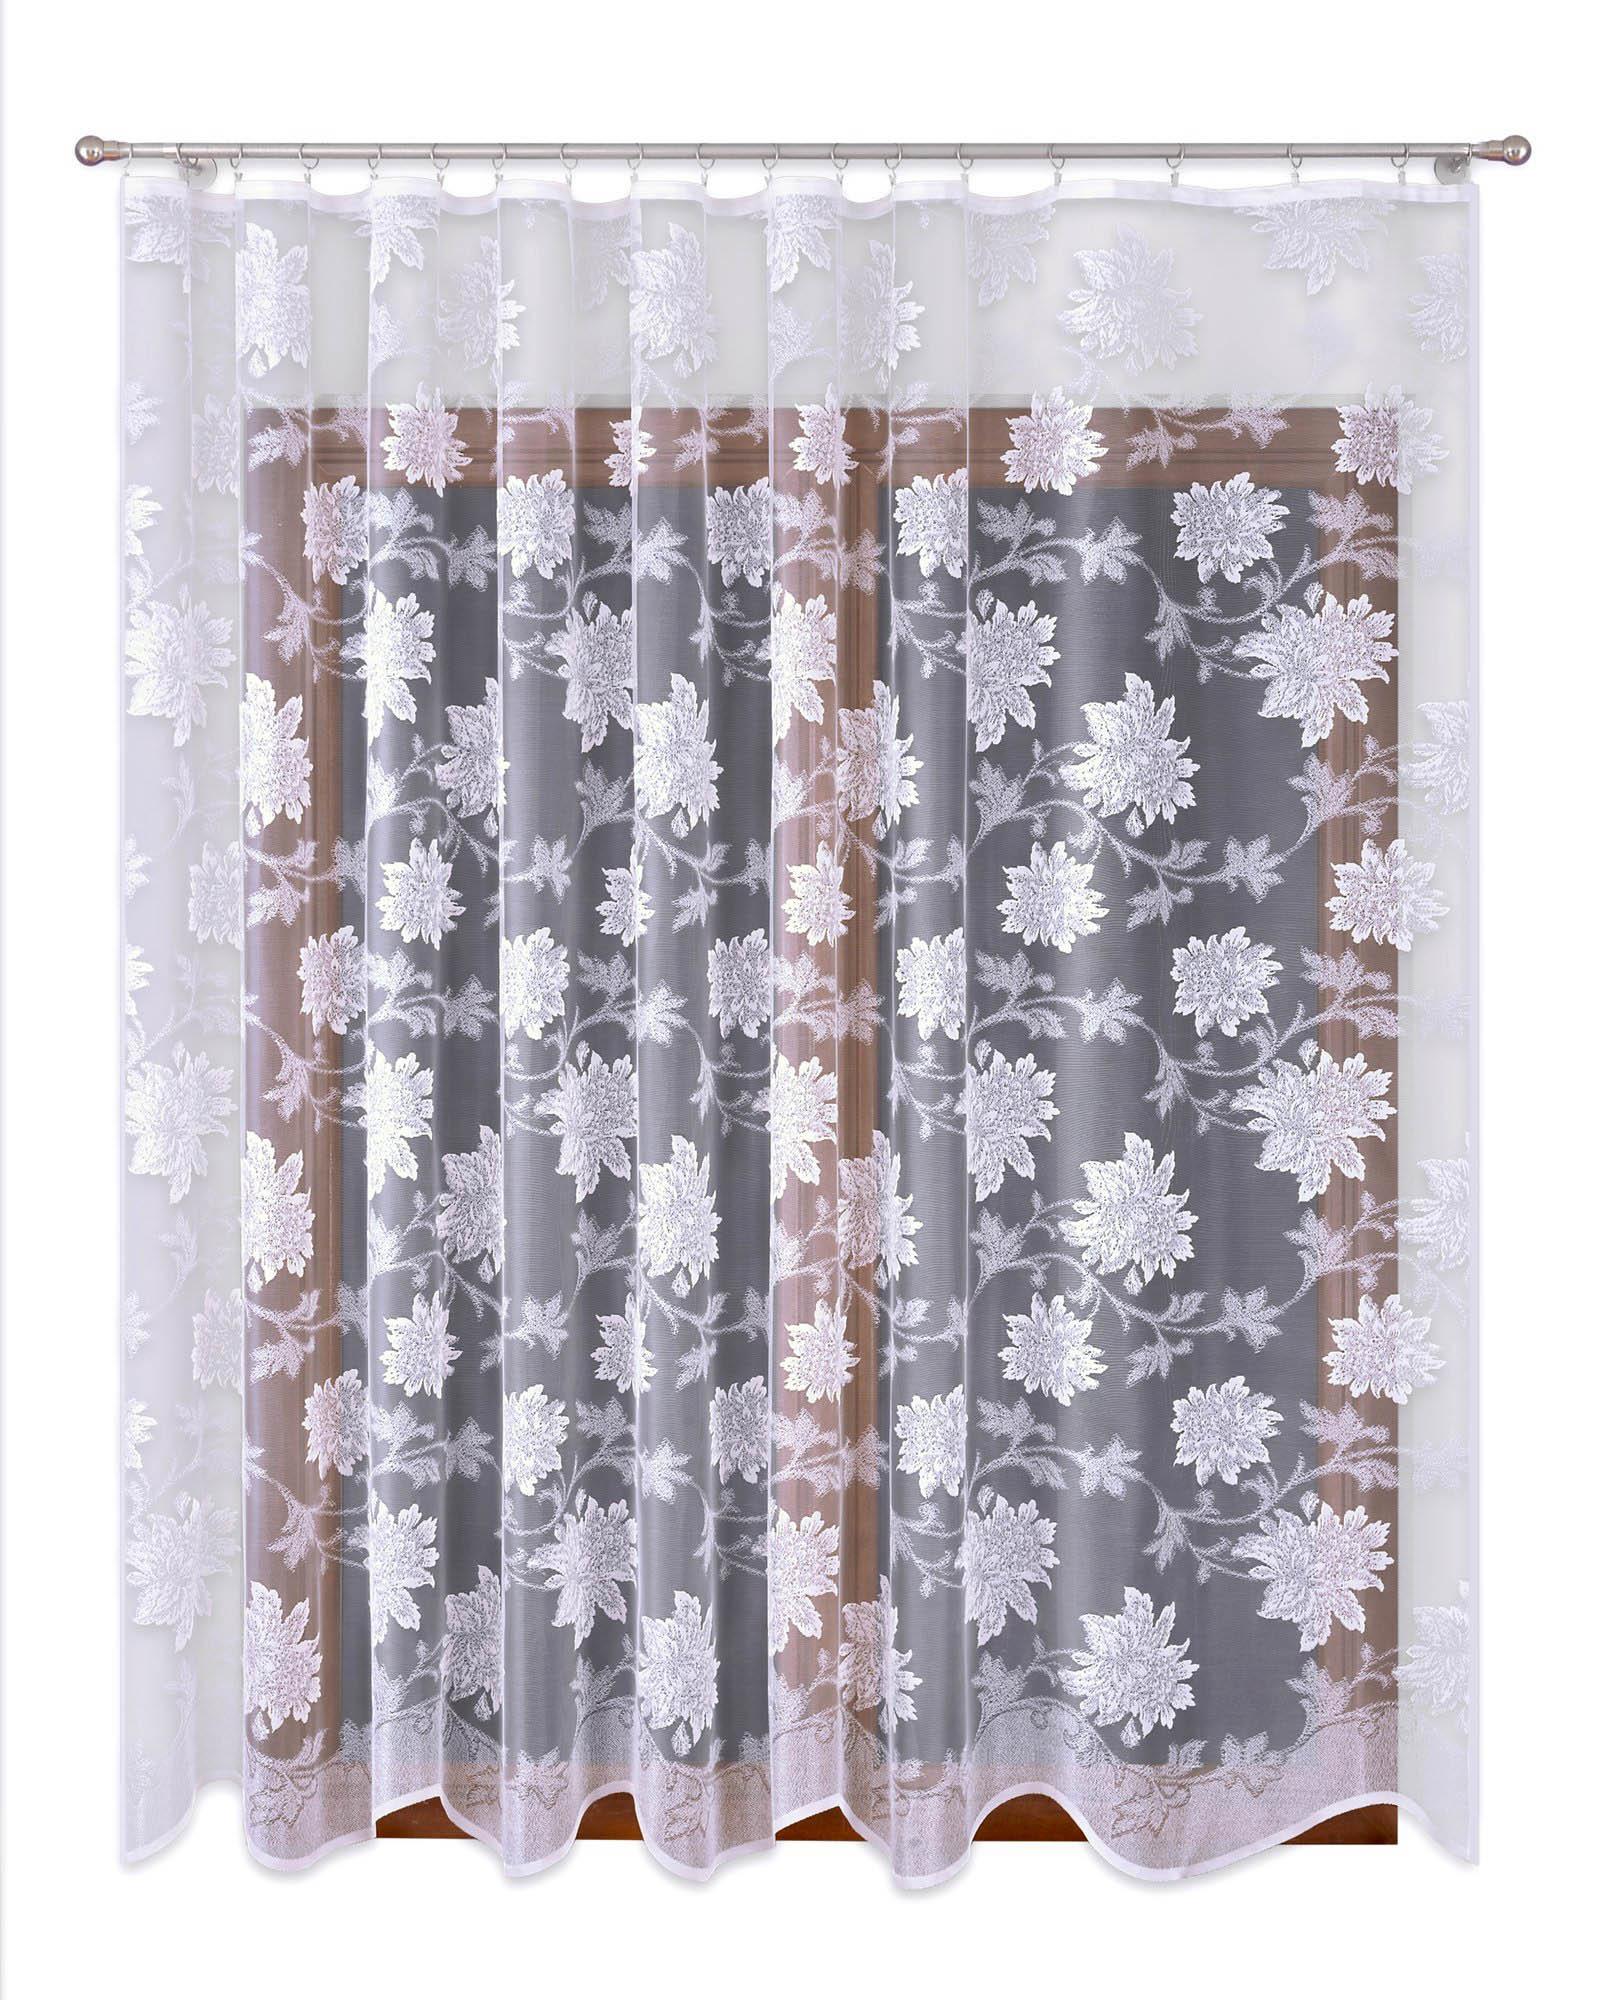 Шторы Primavera Классические шторы Kaylynn Цвет: Белый шторы primavera классические шторы didi цвет белый